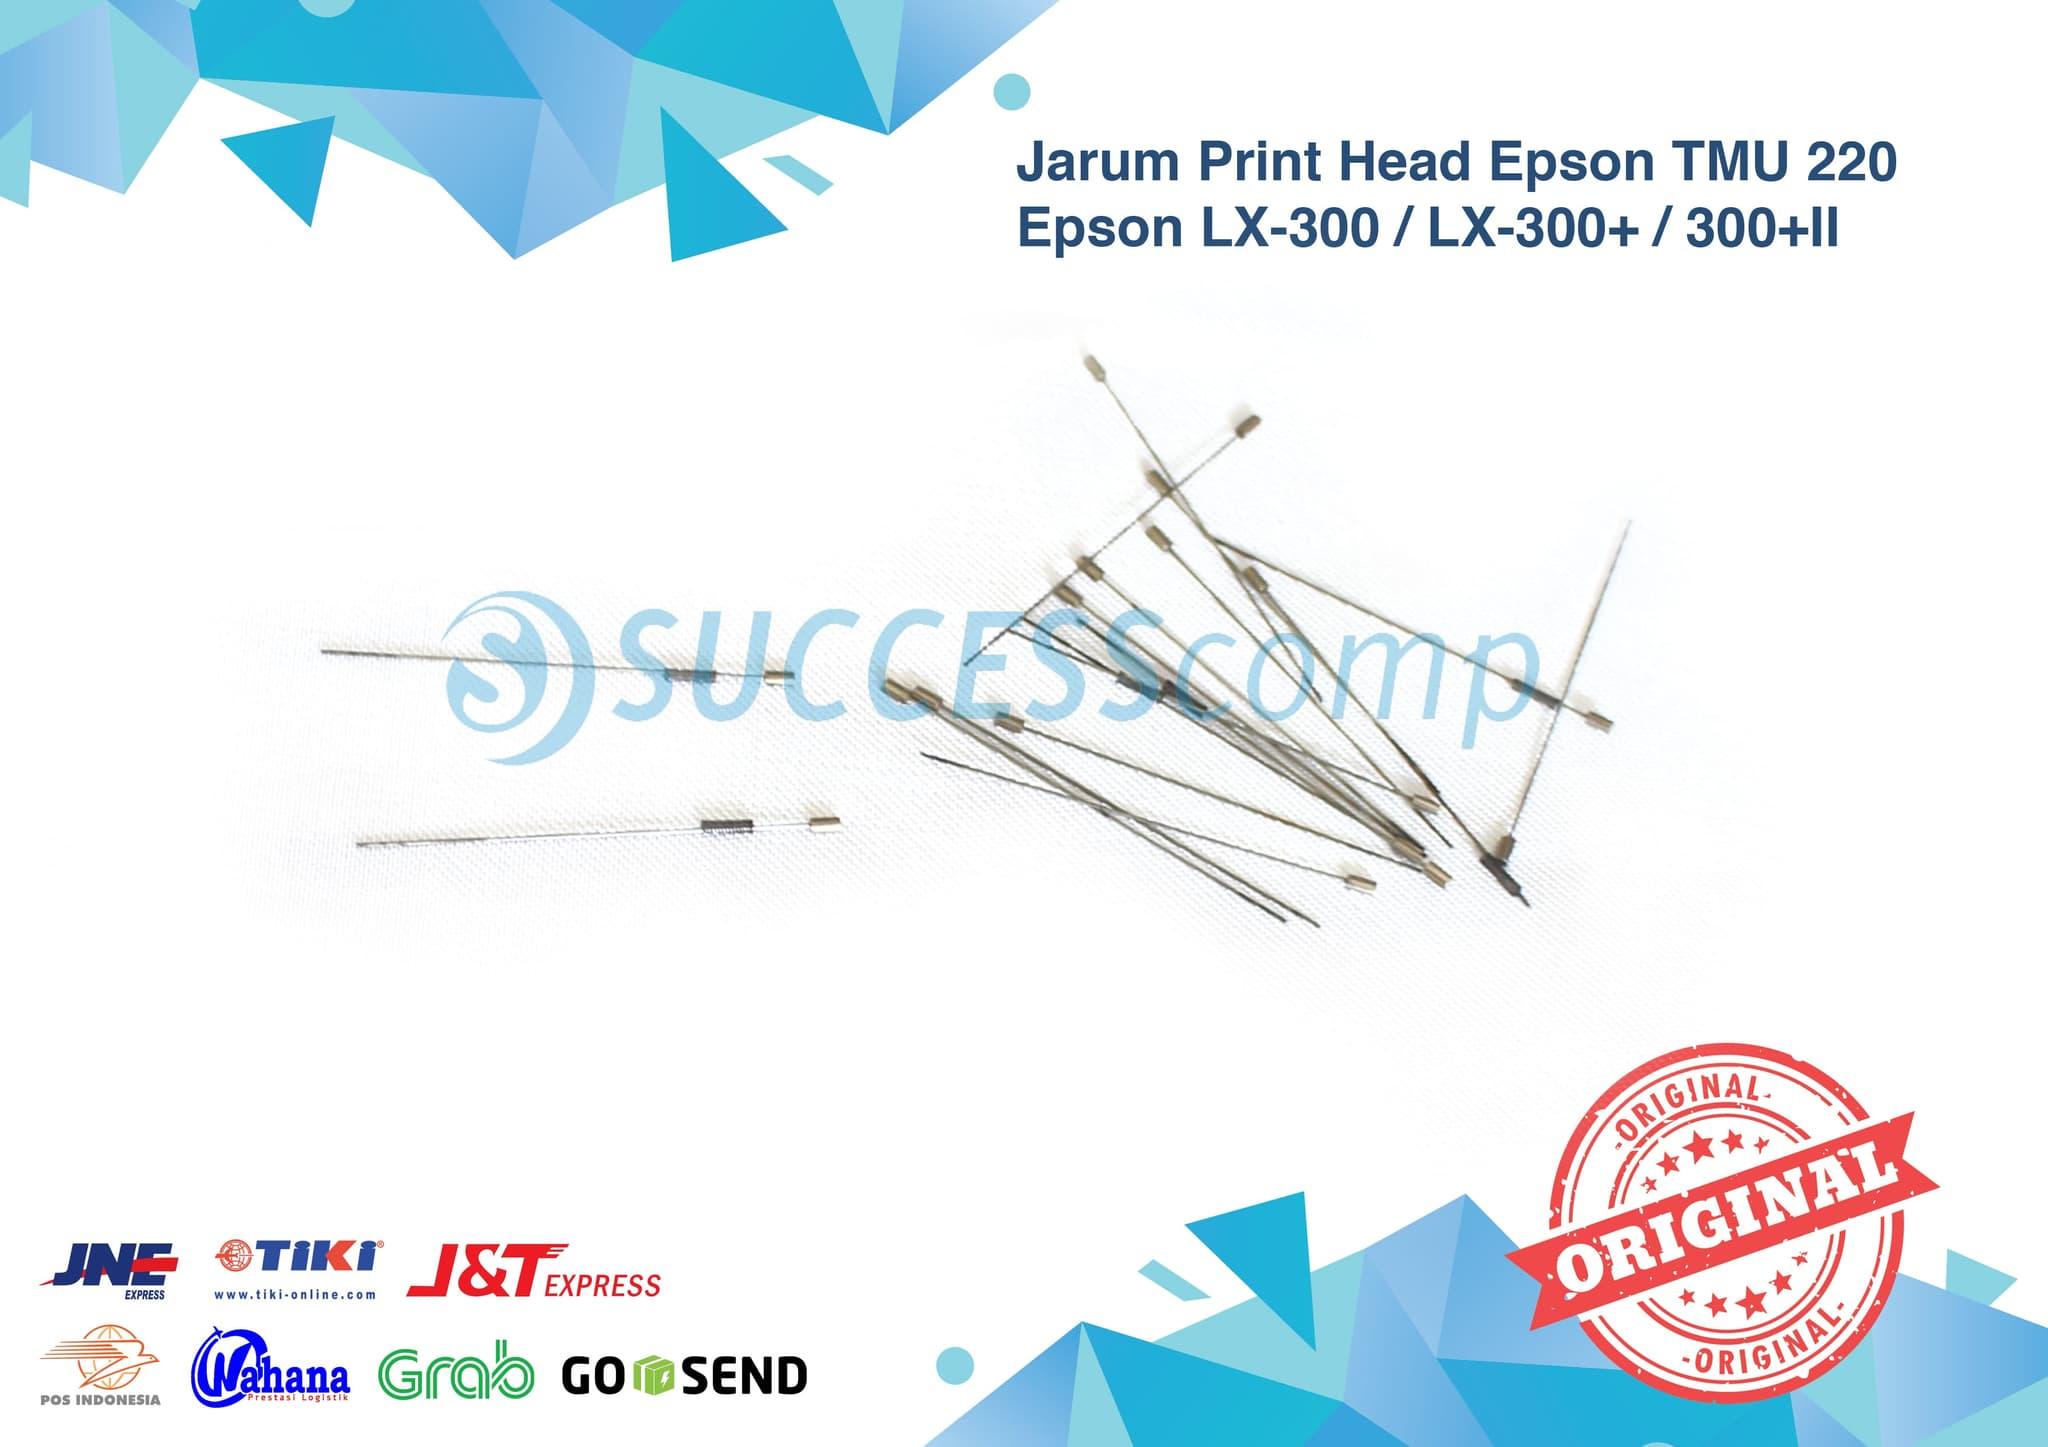 Jual Jarum Print Head Epson Tmu220 New Success Comp Tokopedia Tmu 220